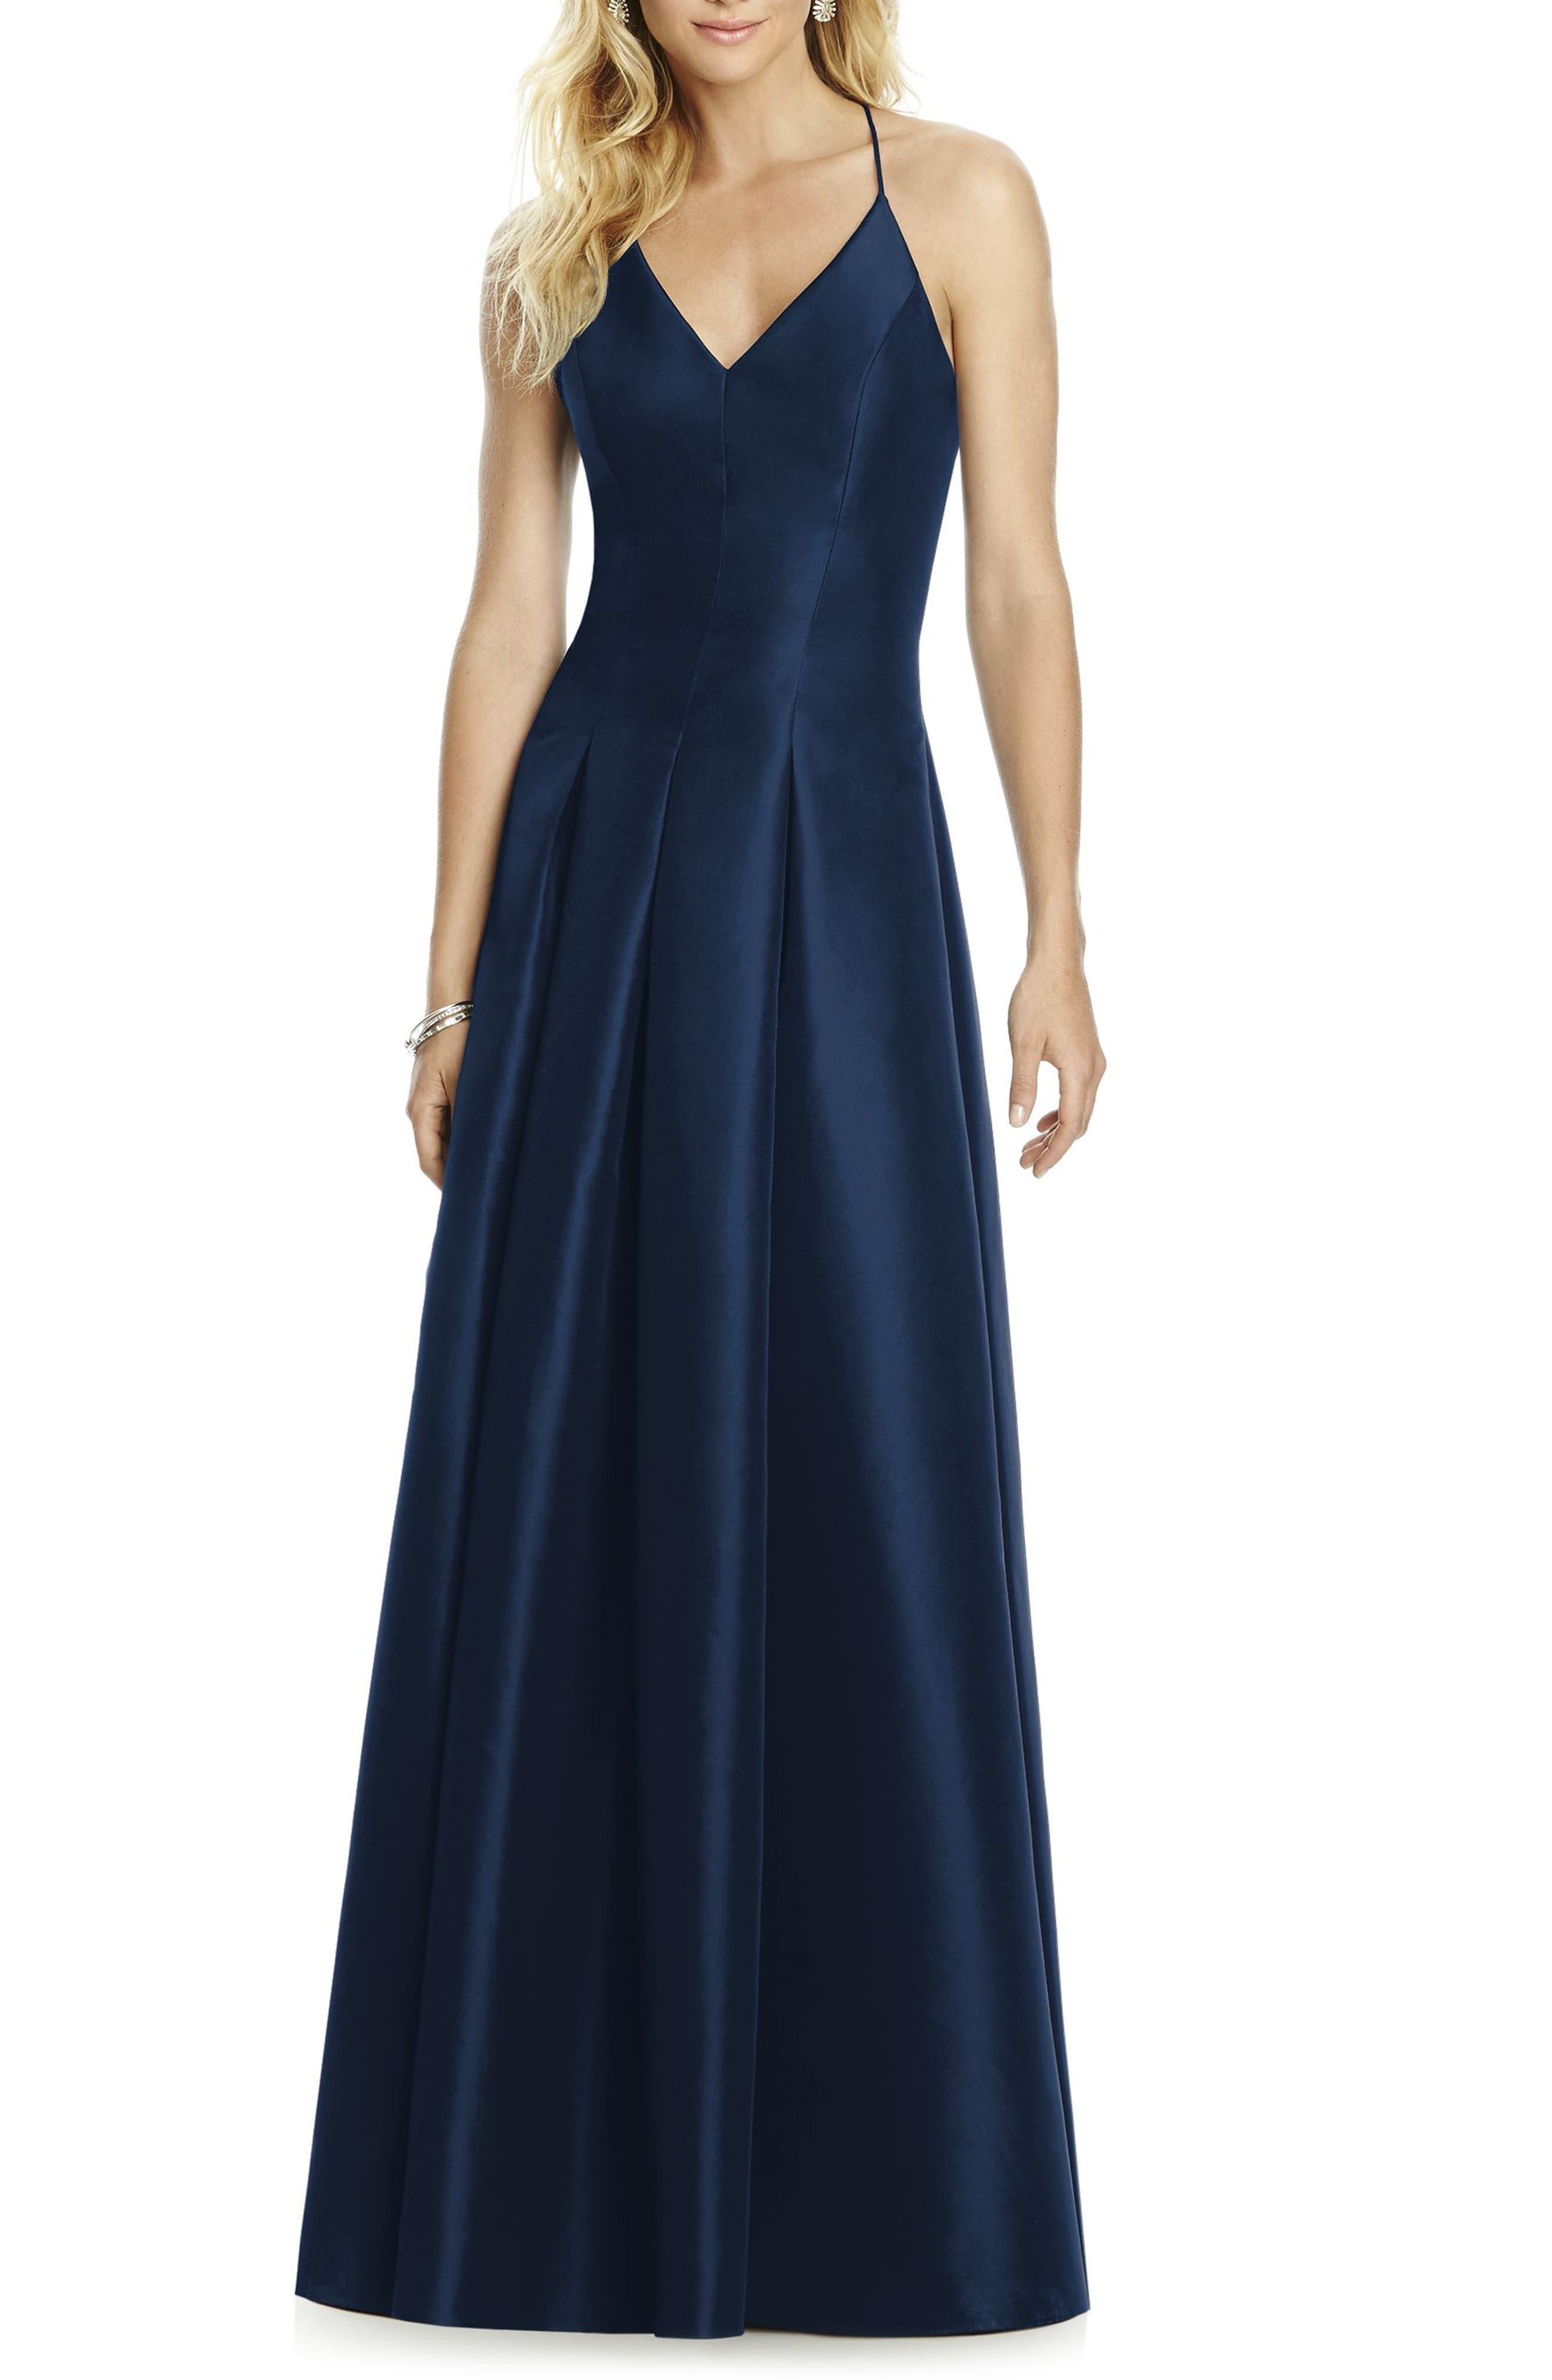 Main Image - After Six Cross Back Taffeta A-Line Gown